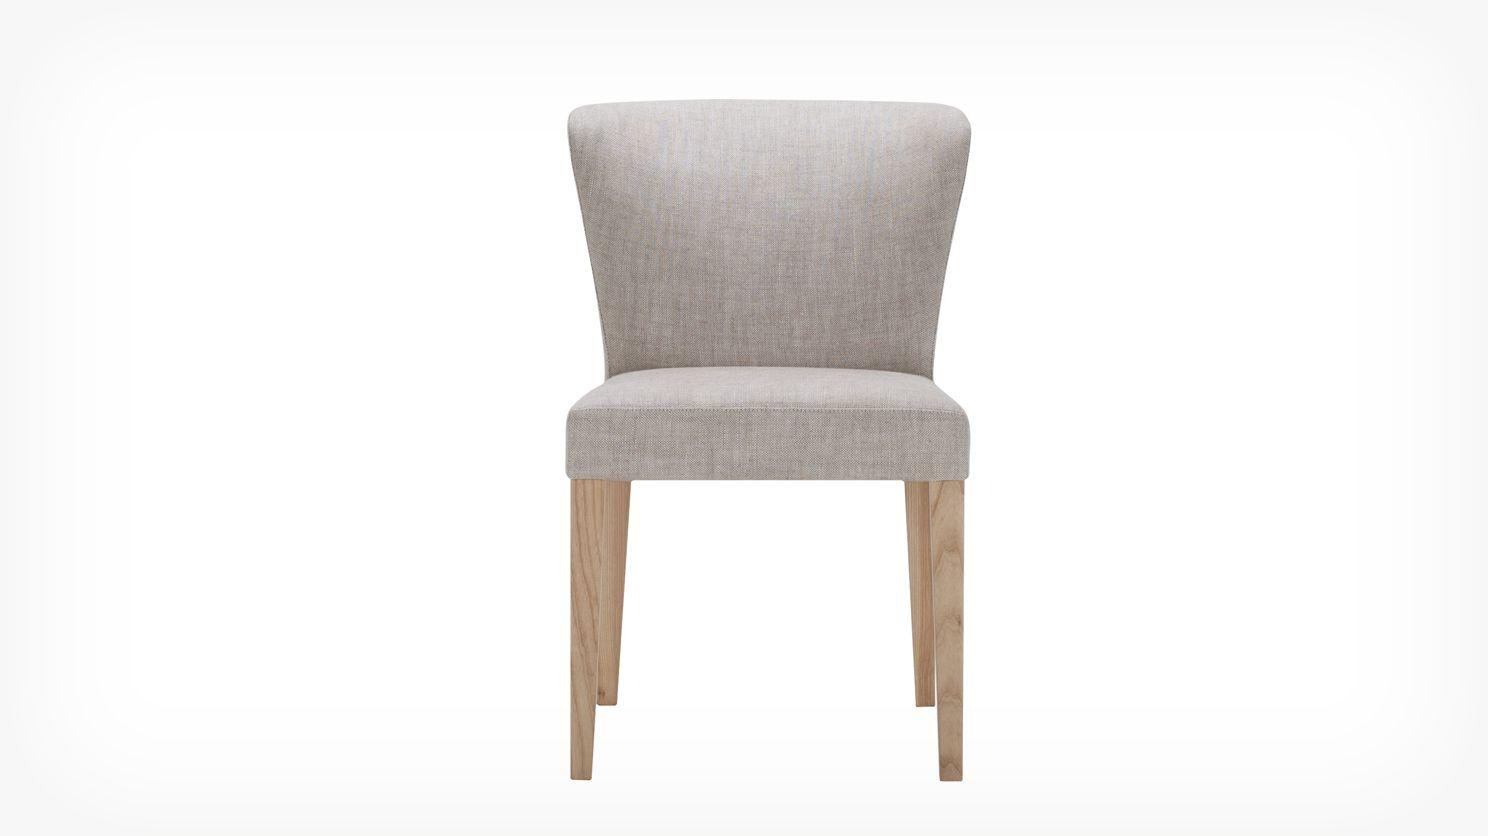 Frances Chair Eq3 Modern Furniture Dinning Room Chairs Comfortable Dining Chairs Dinning Chairs